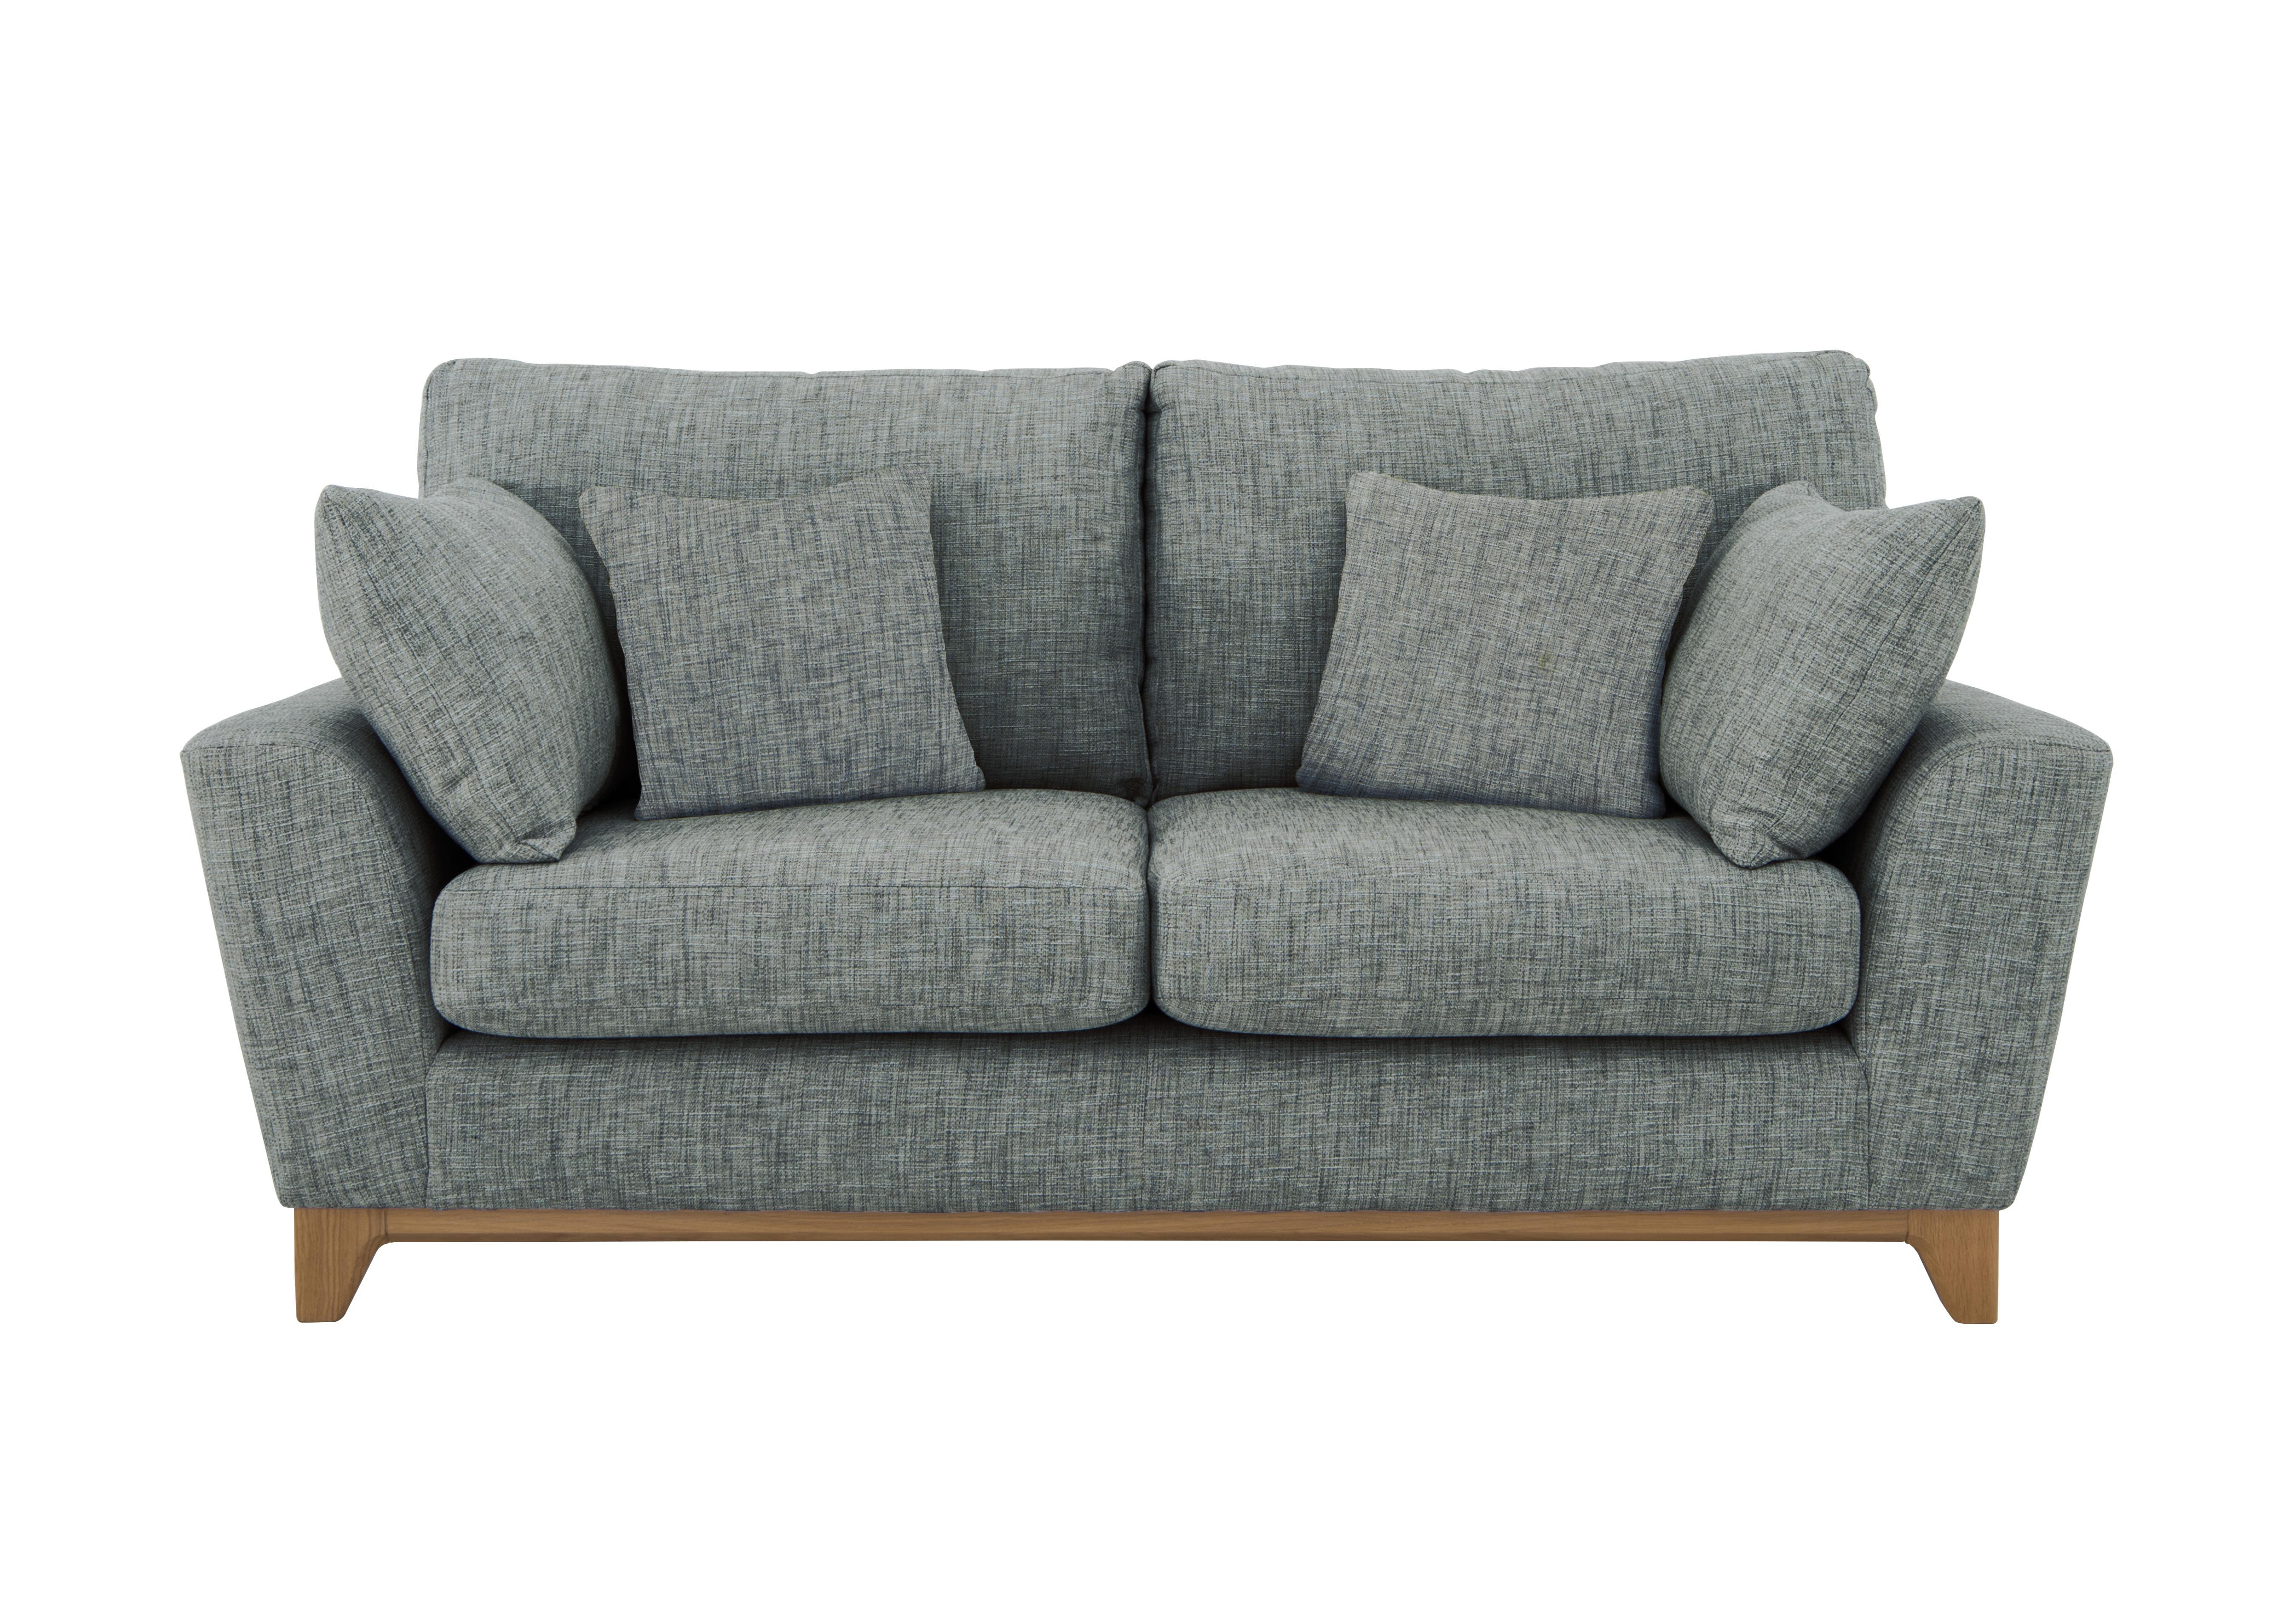 novara fabric large sofa ercol furniture village rh furniturevillage co uk large sofa chair cover large sofa furniture throw